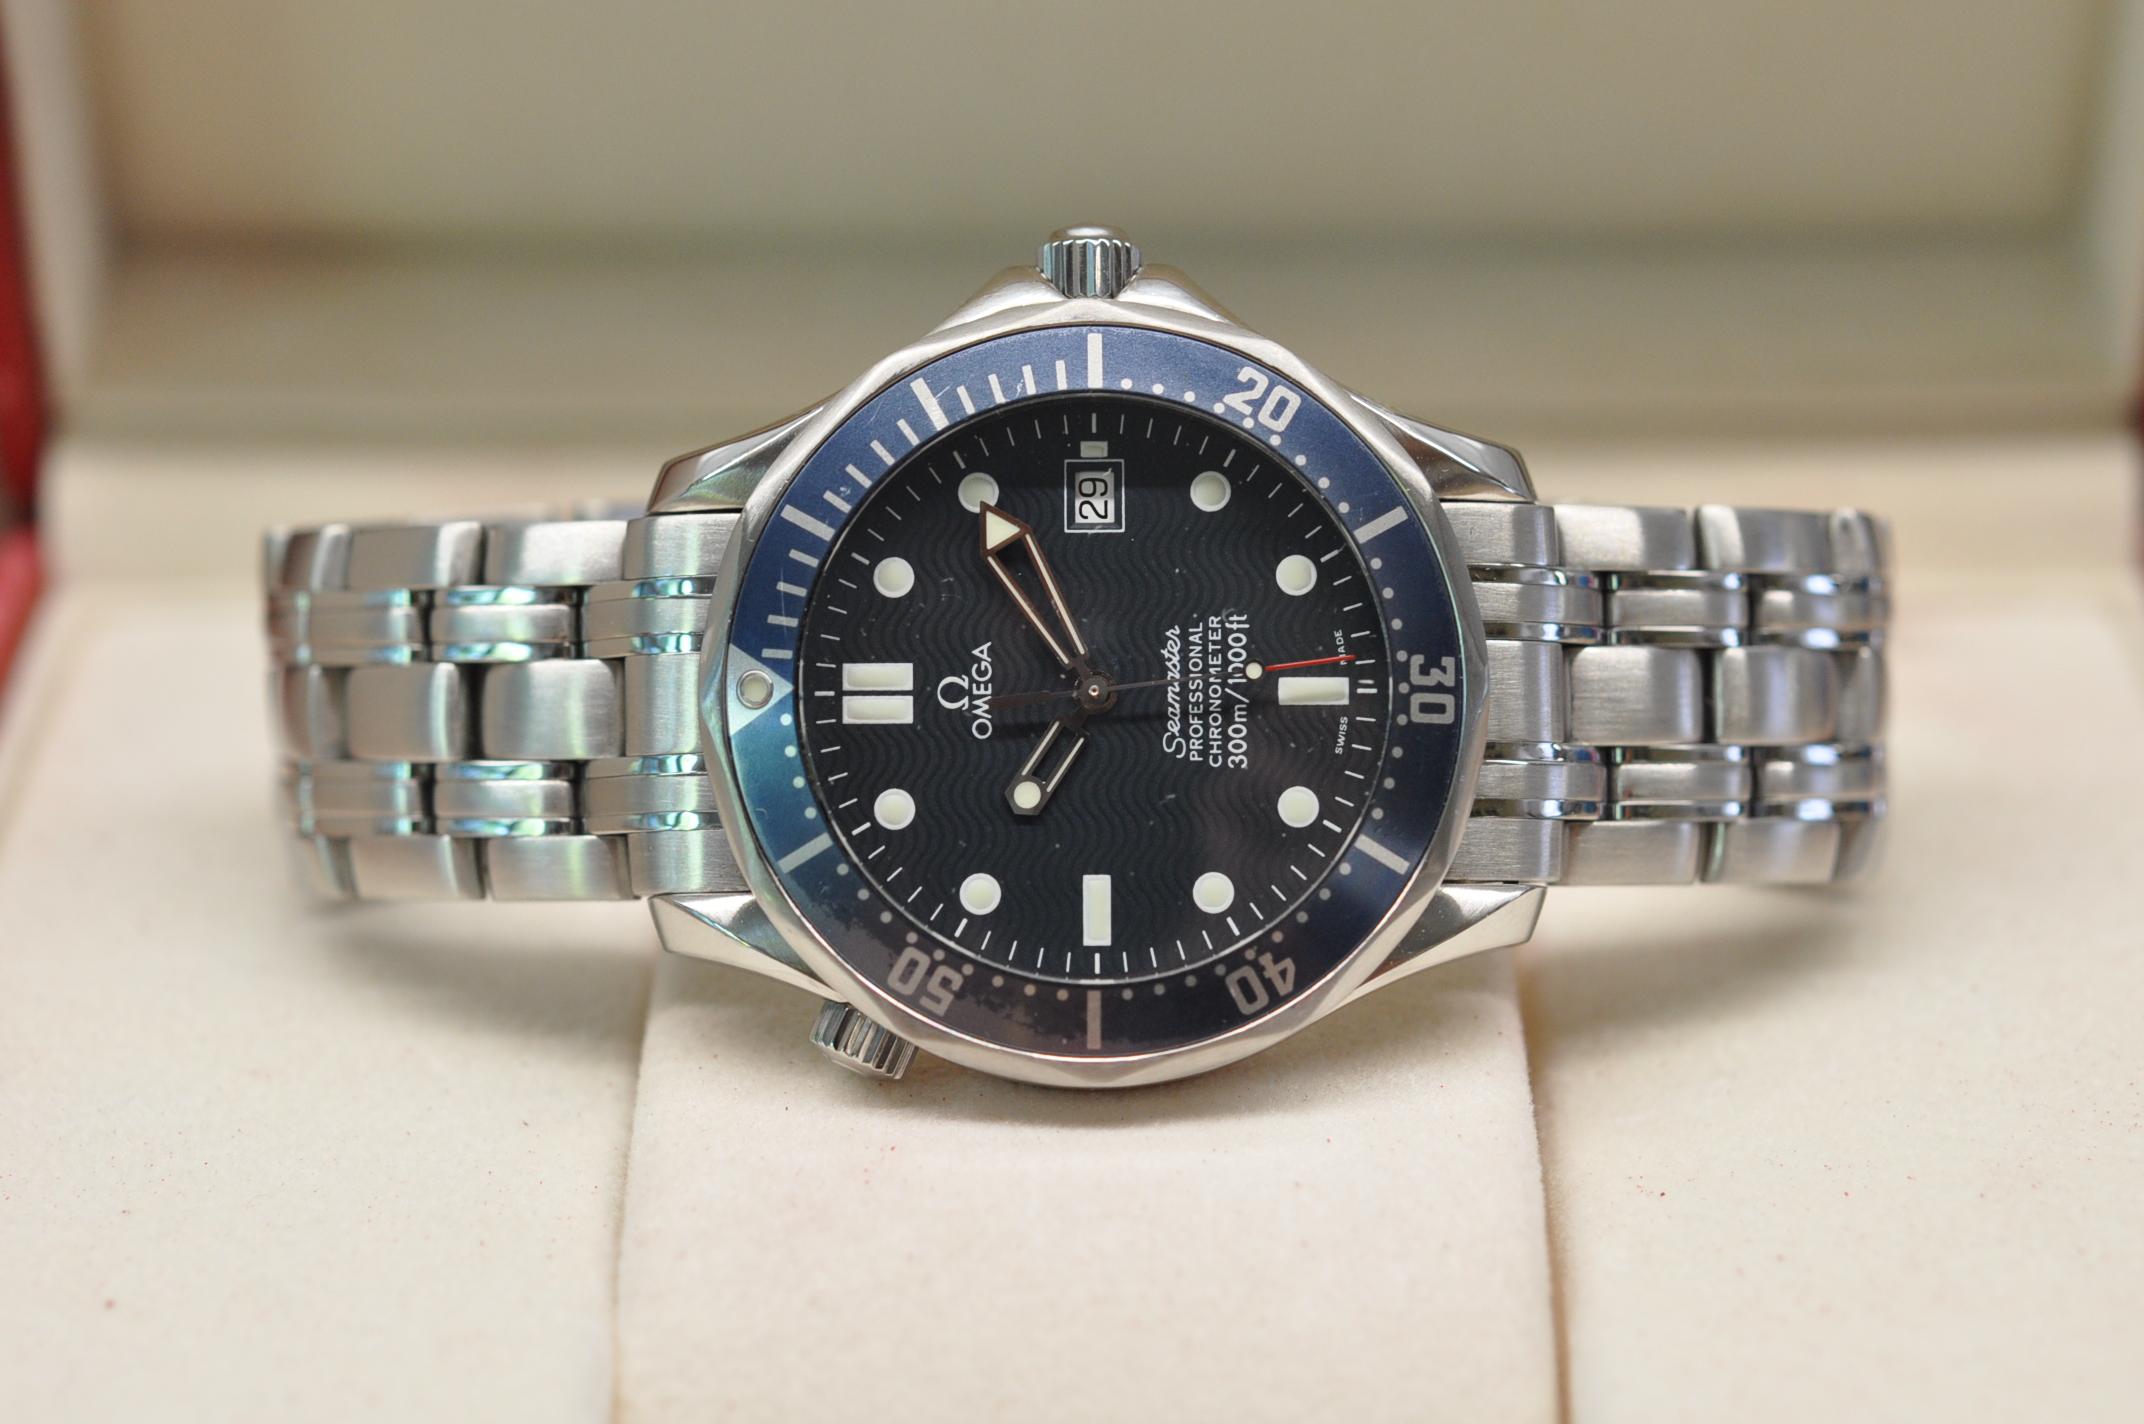 2000 Seamaster Diver Pro 2531.80.00